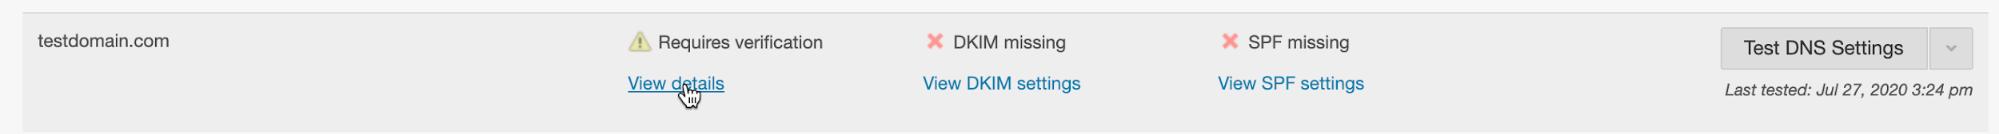 Screenshot of testing domain settings in Mailchimp Transactional